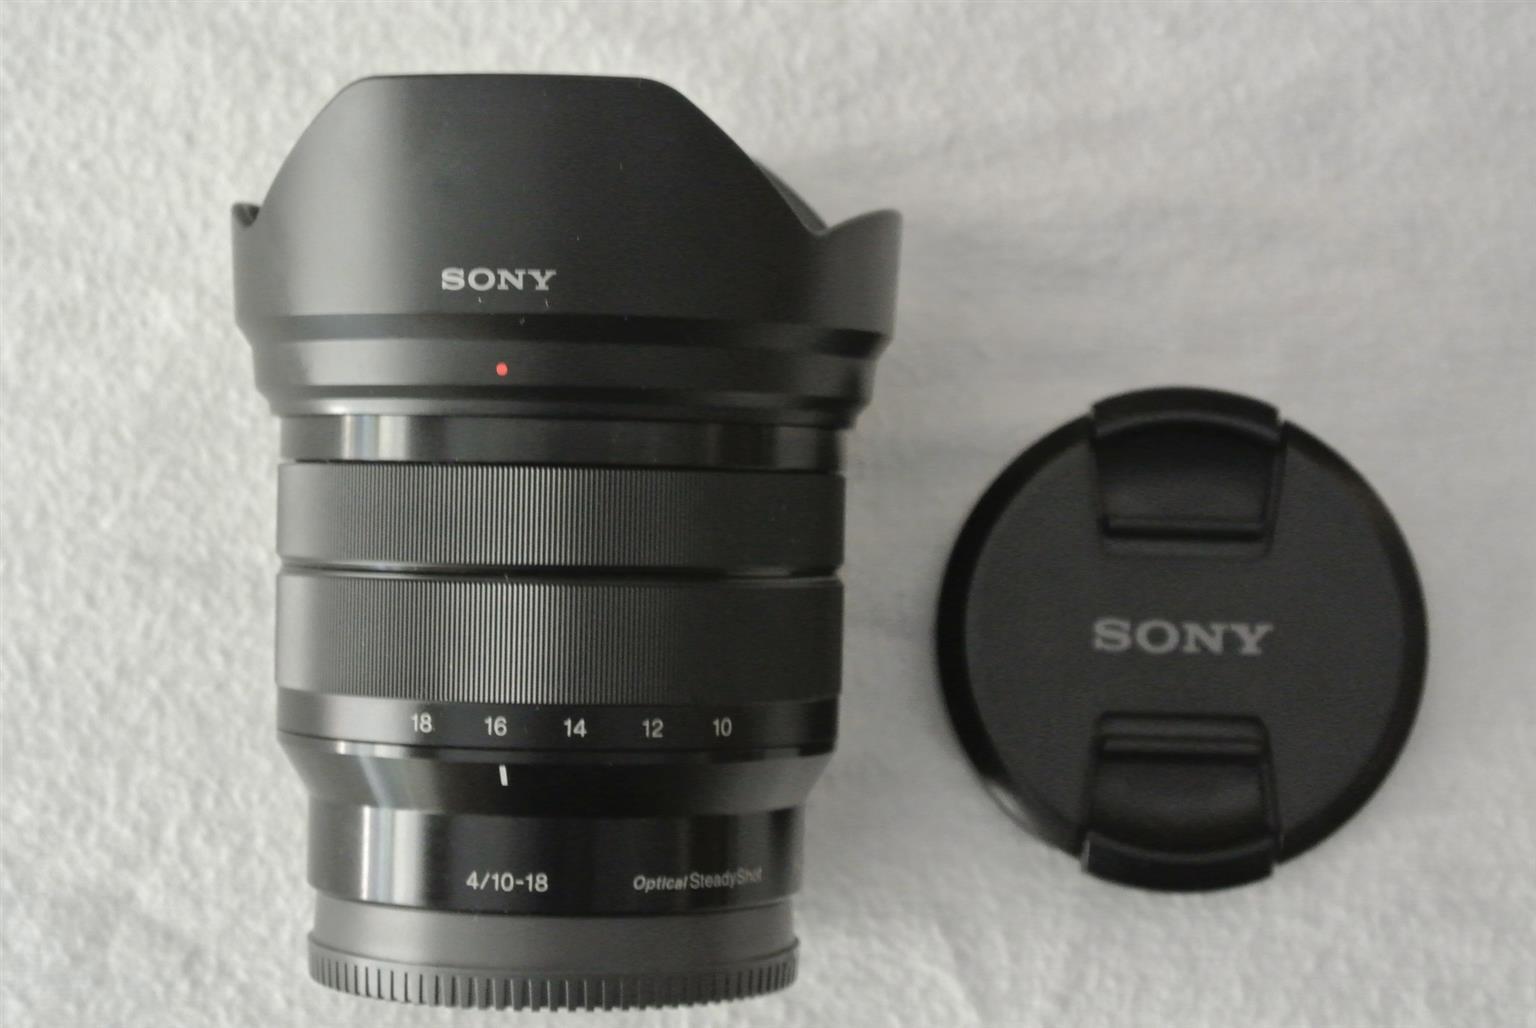 Sony E 10-18 F4 OSS Lens (E Mount) Mint Condition